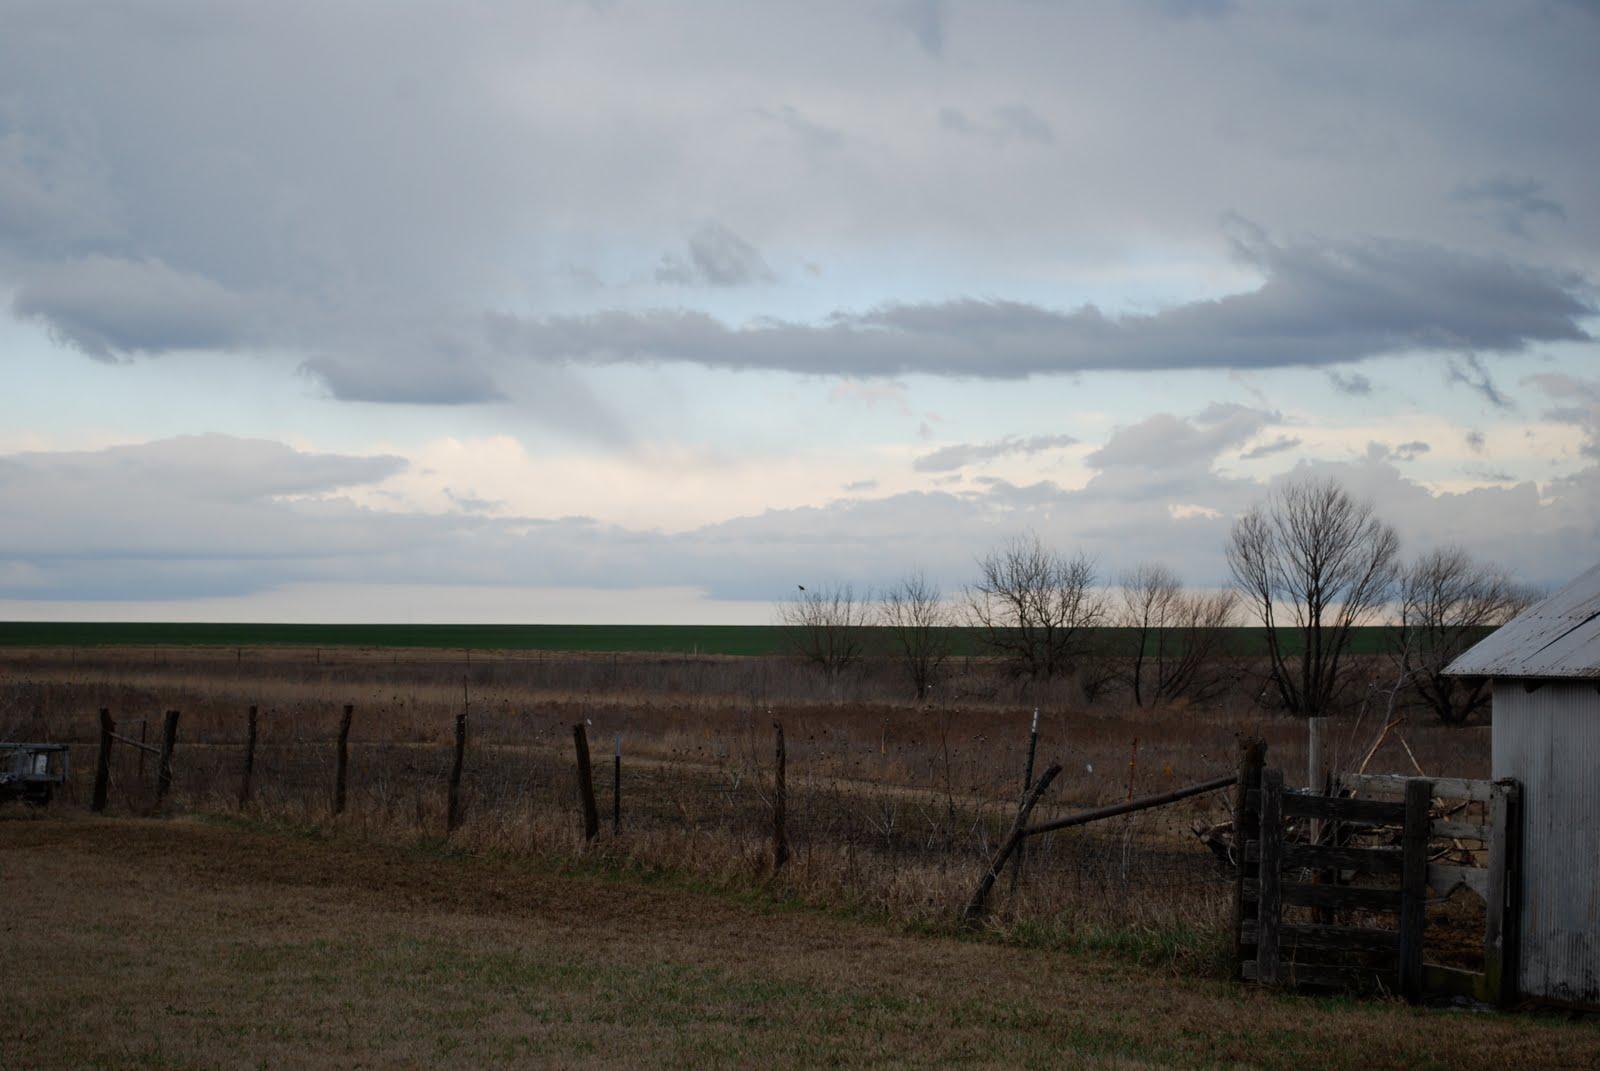 Smithville, Ohio: Storm Krissy